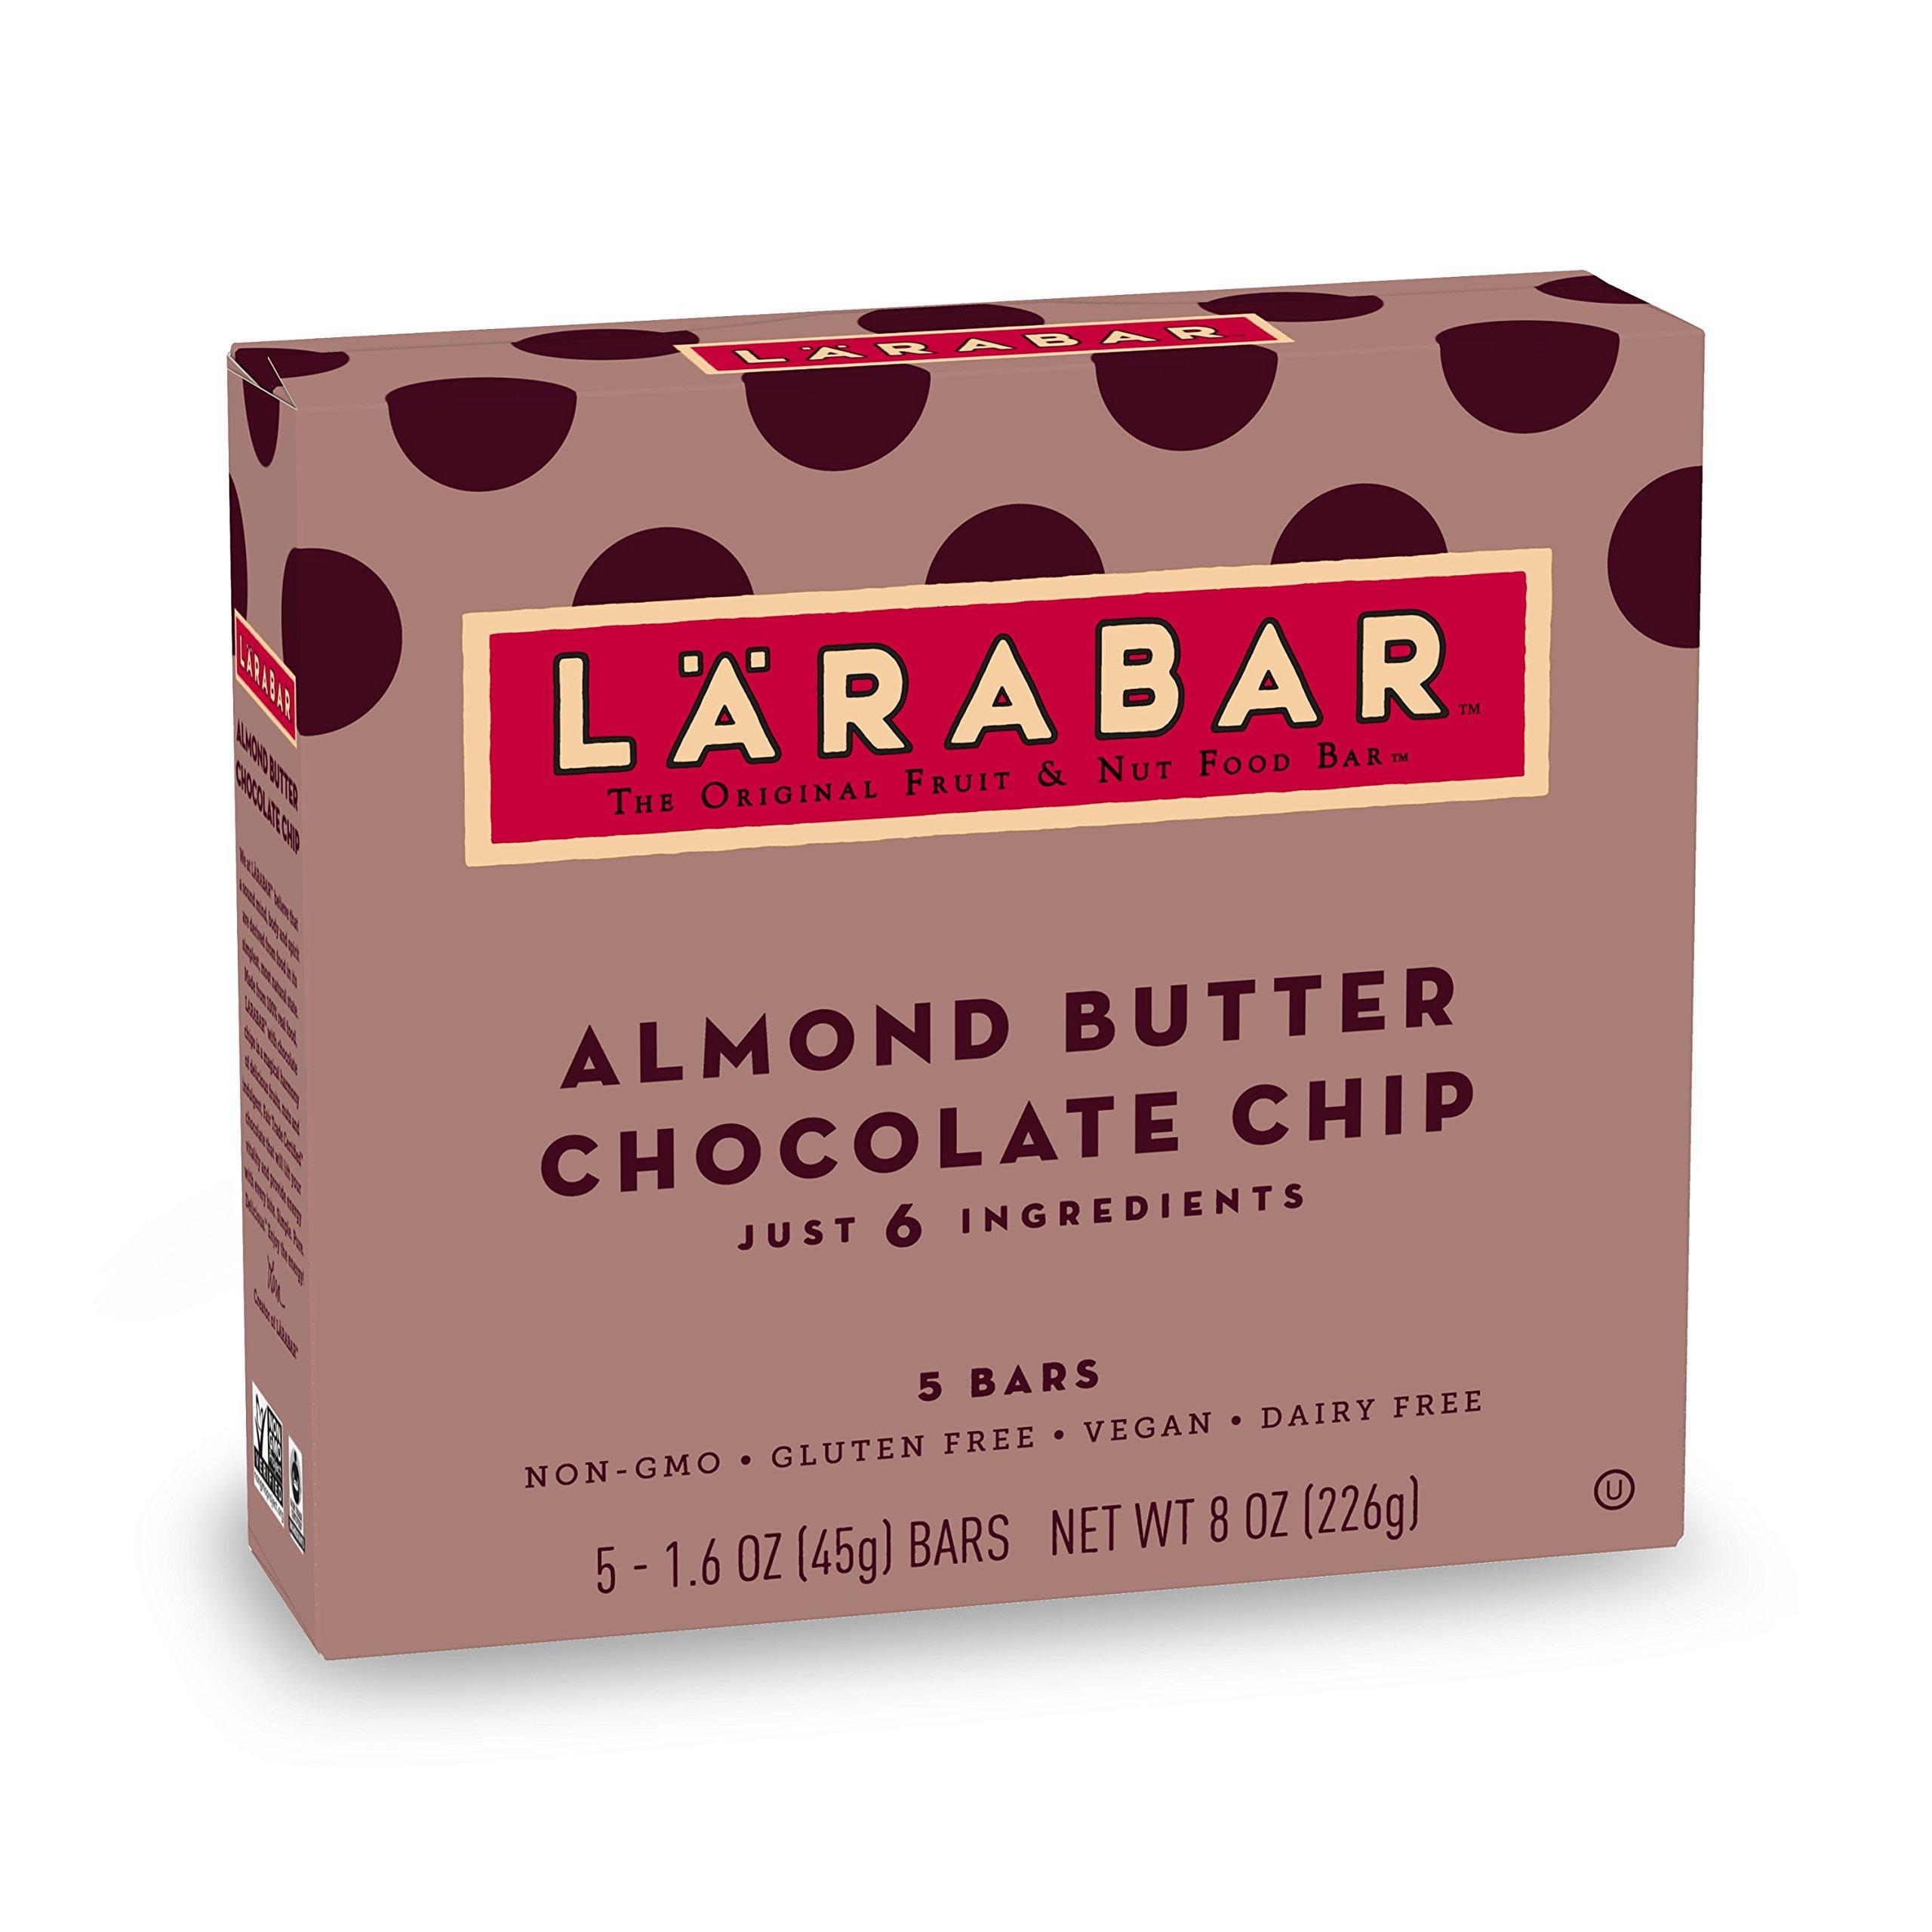 Larabar Gluten Free Bar, Almond Butter Chocolate Chip, 1.6 oz Bars (5 Count), Whole Food Gluten Free Bars, Dairy Free Snacks